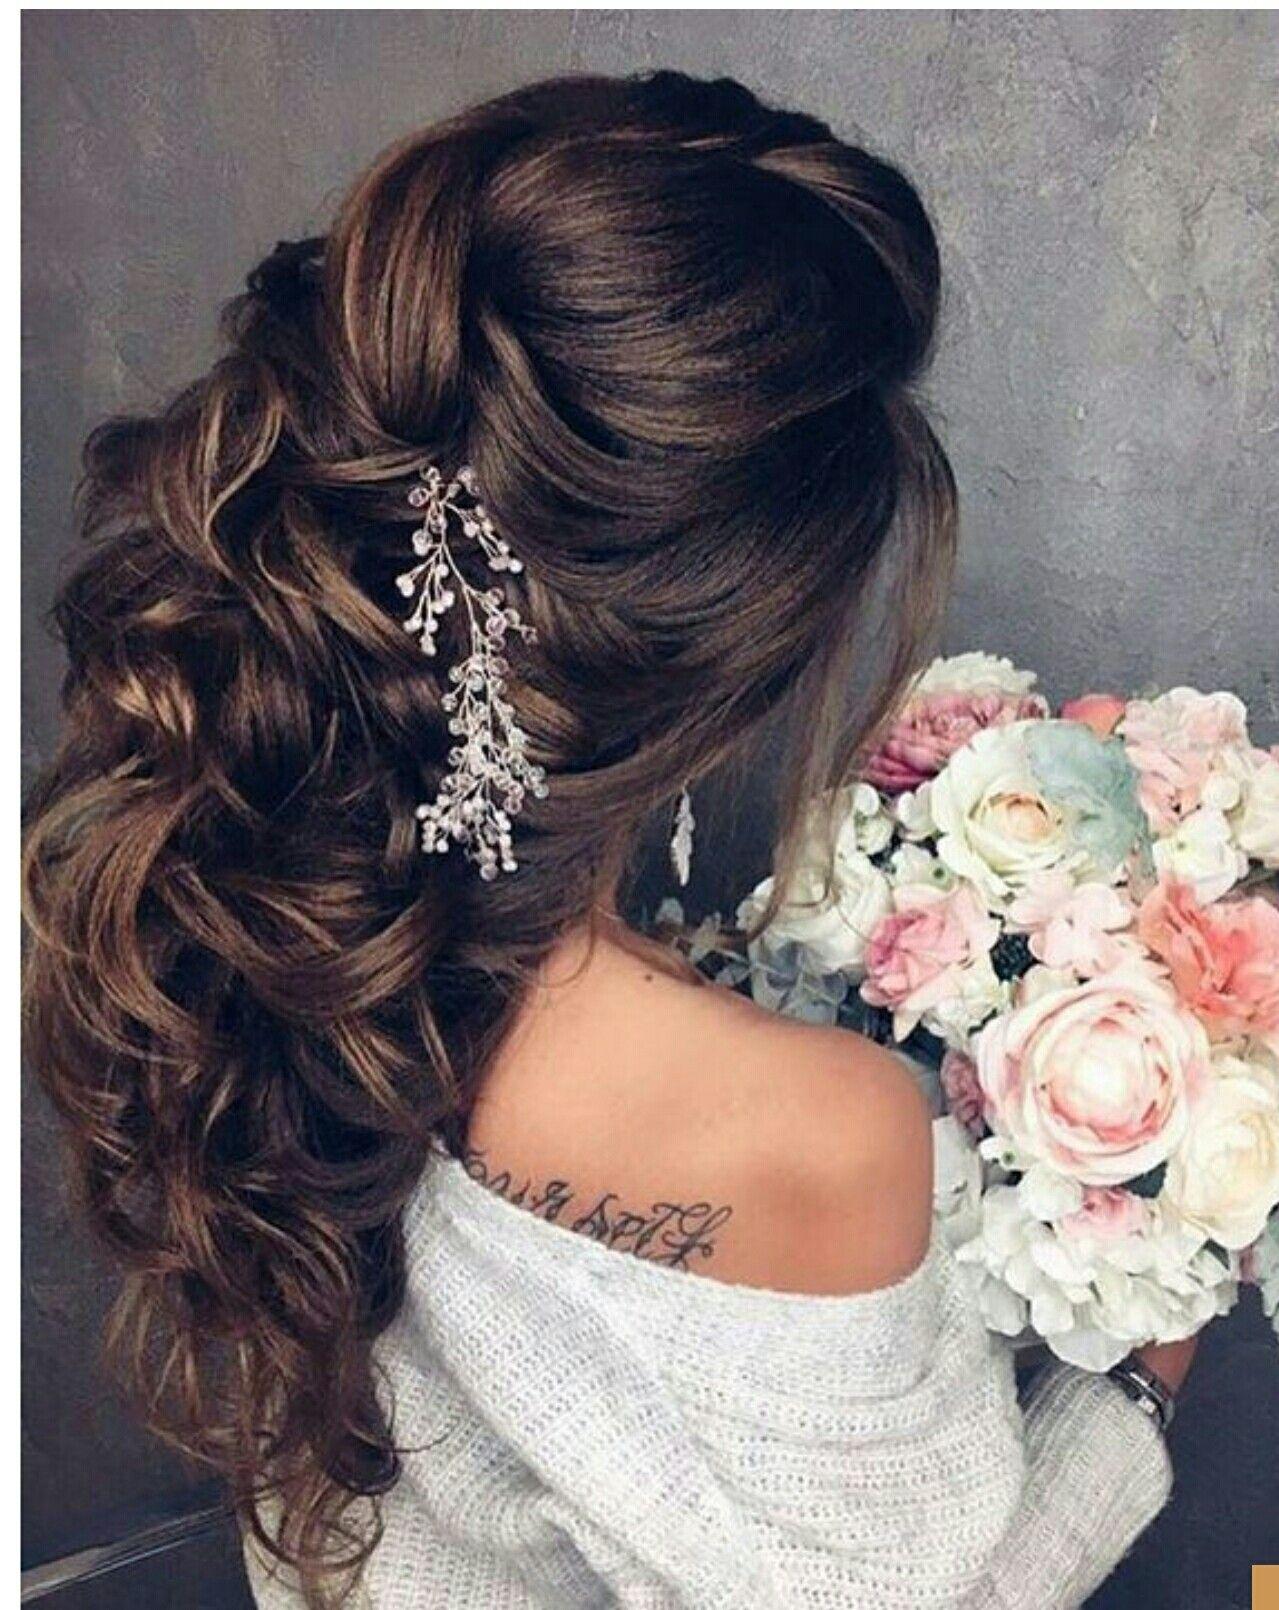 Pin by Sarah McNeese on Hairspiration  Pinterest